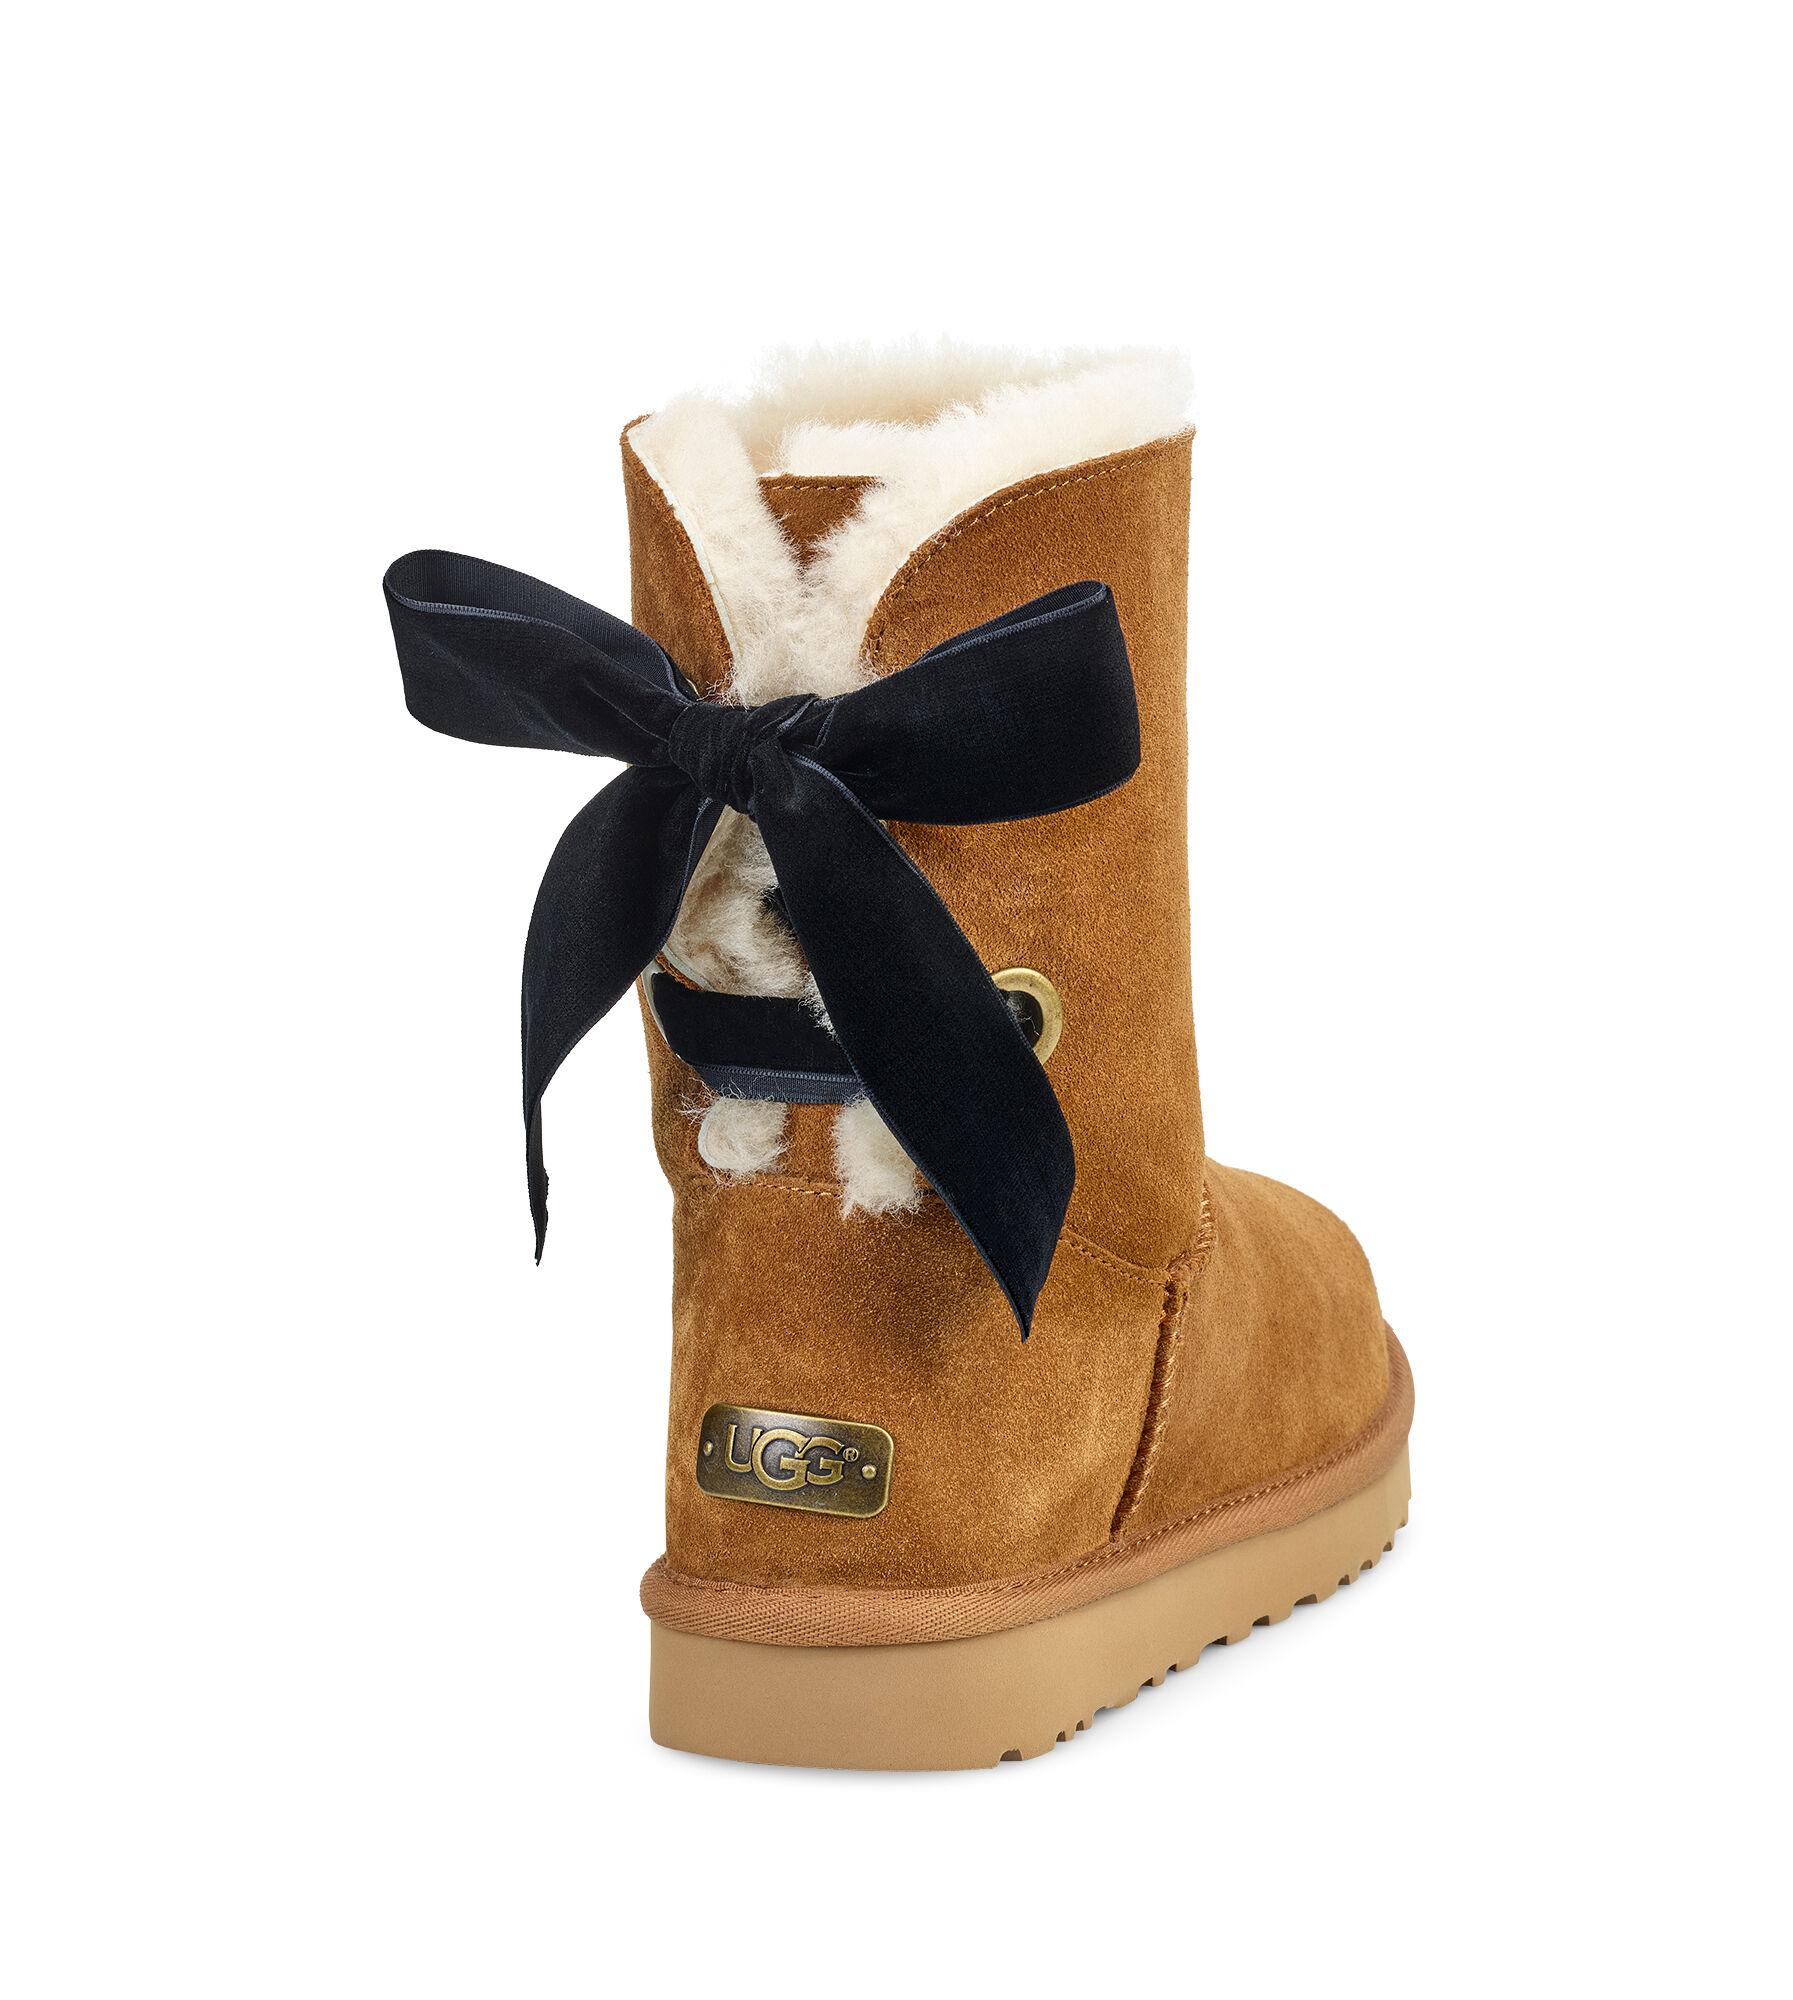 SaleShoesBootsSlippersamp; Ugg® SaleShoesBootsSlippersamp; Women's Ugg® Women's MoreOfficial Nm8y0wOvn